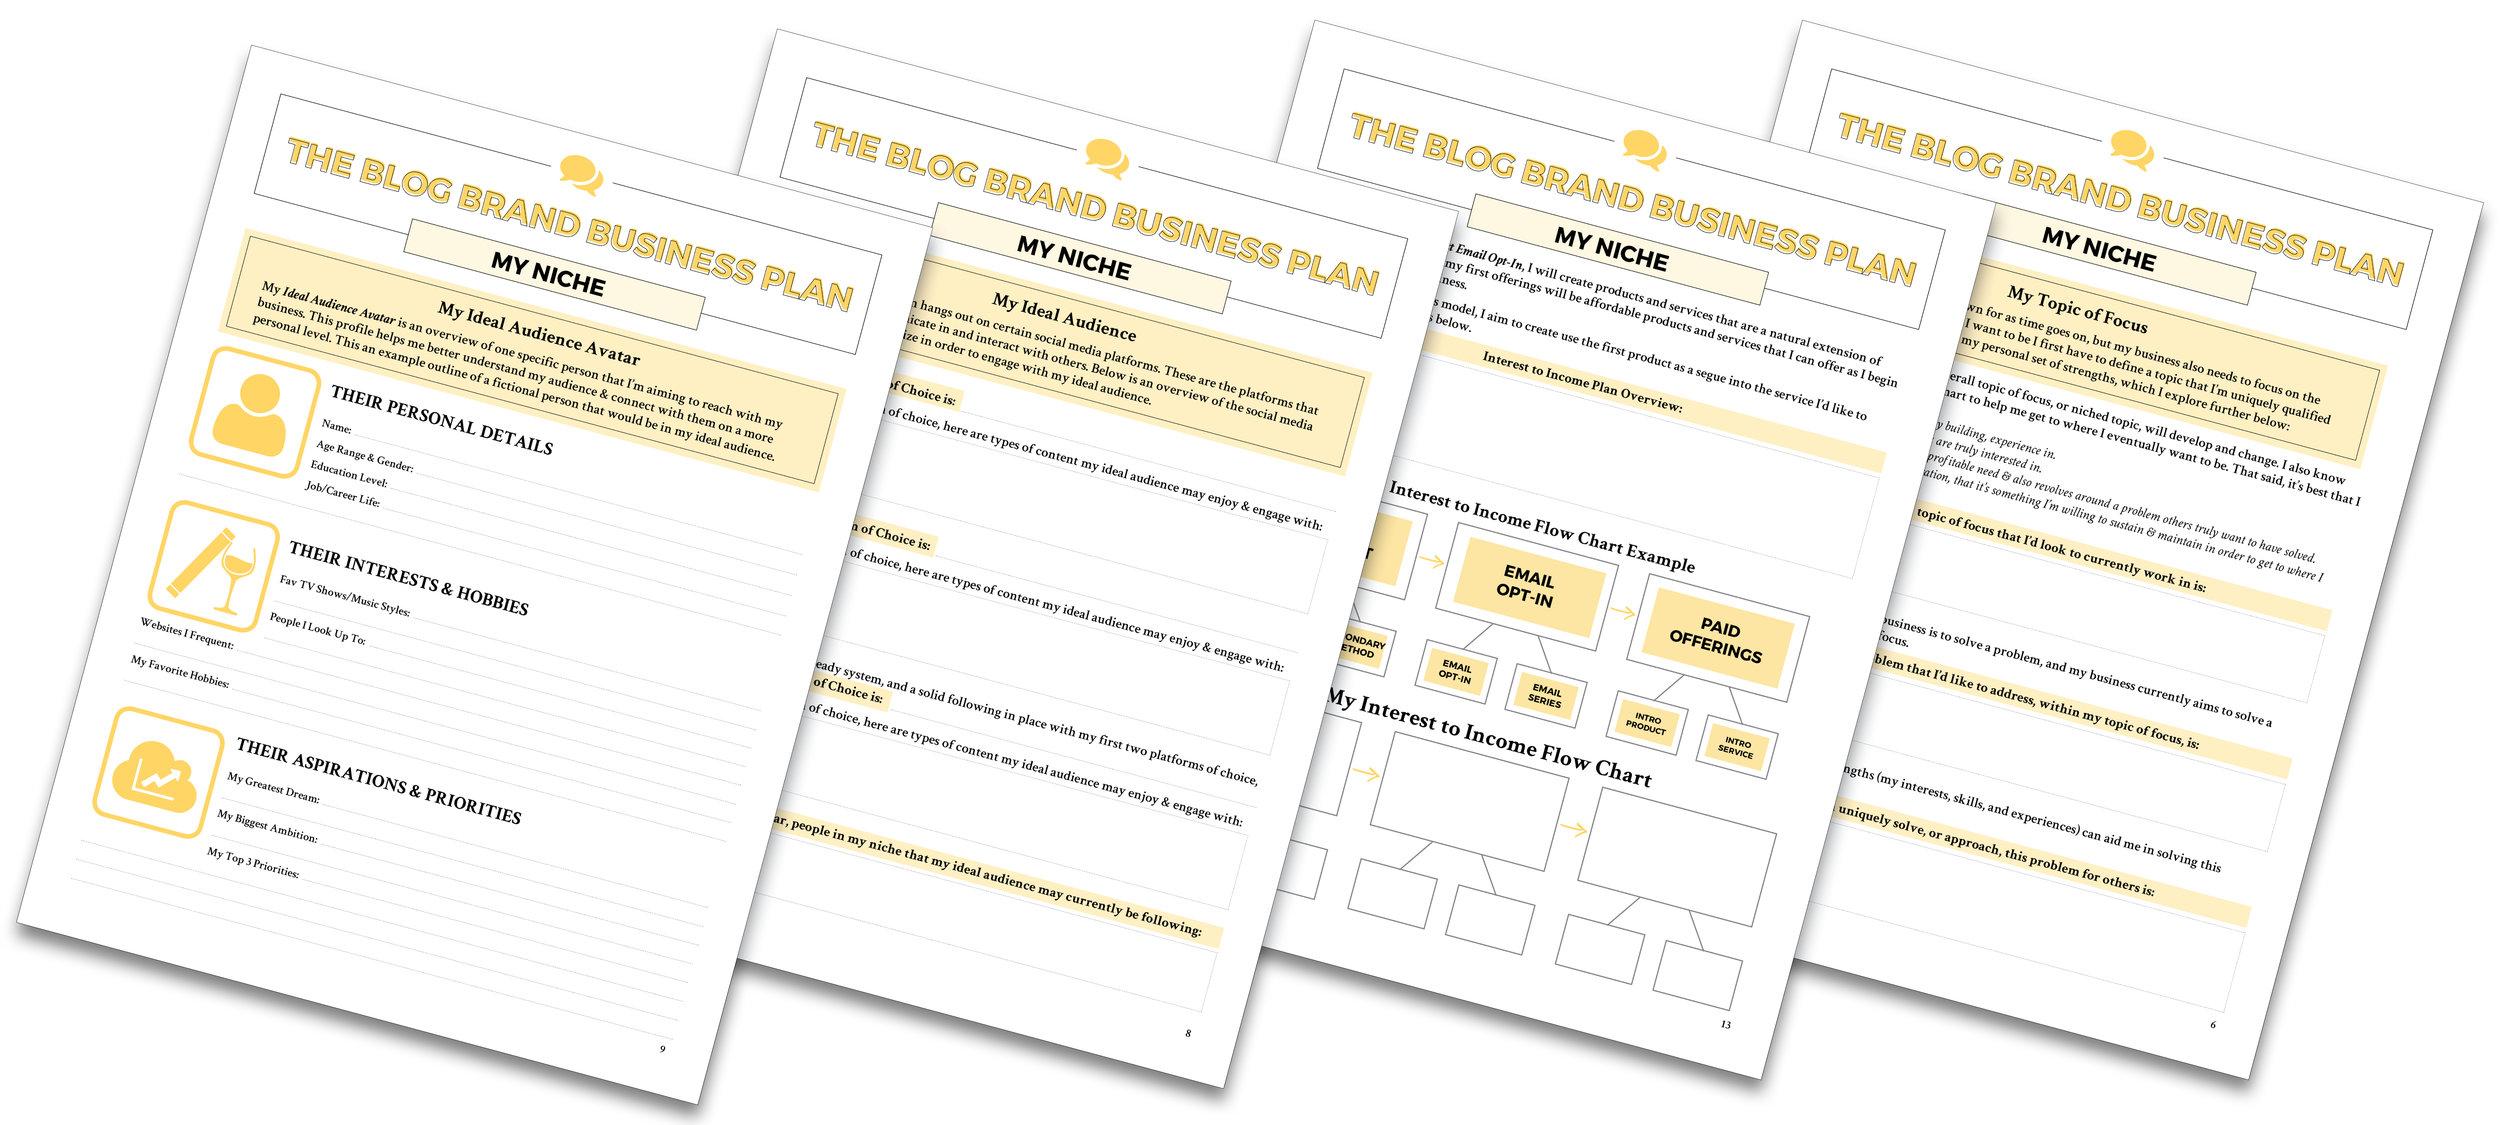 mockup-blog-brand-business-plan-STAGE-1.jpg